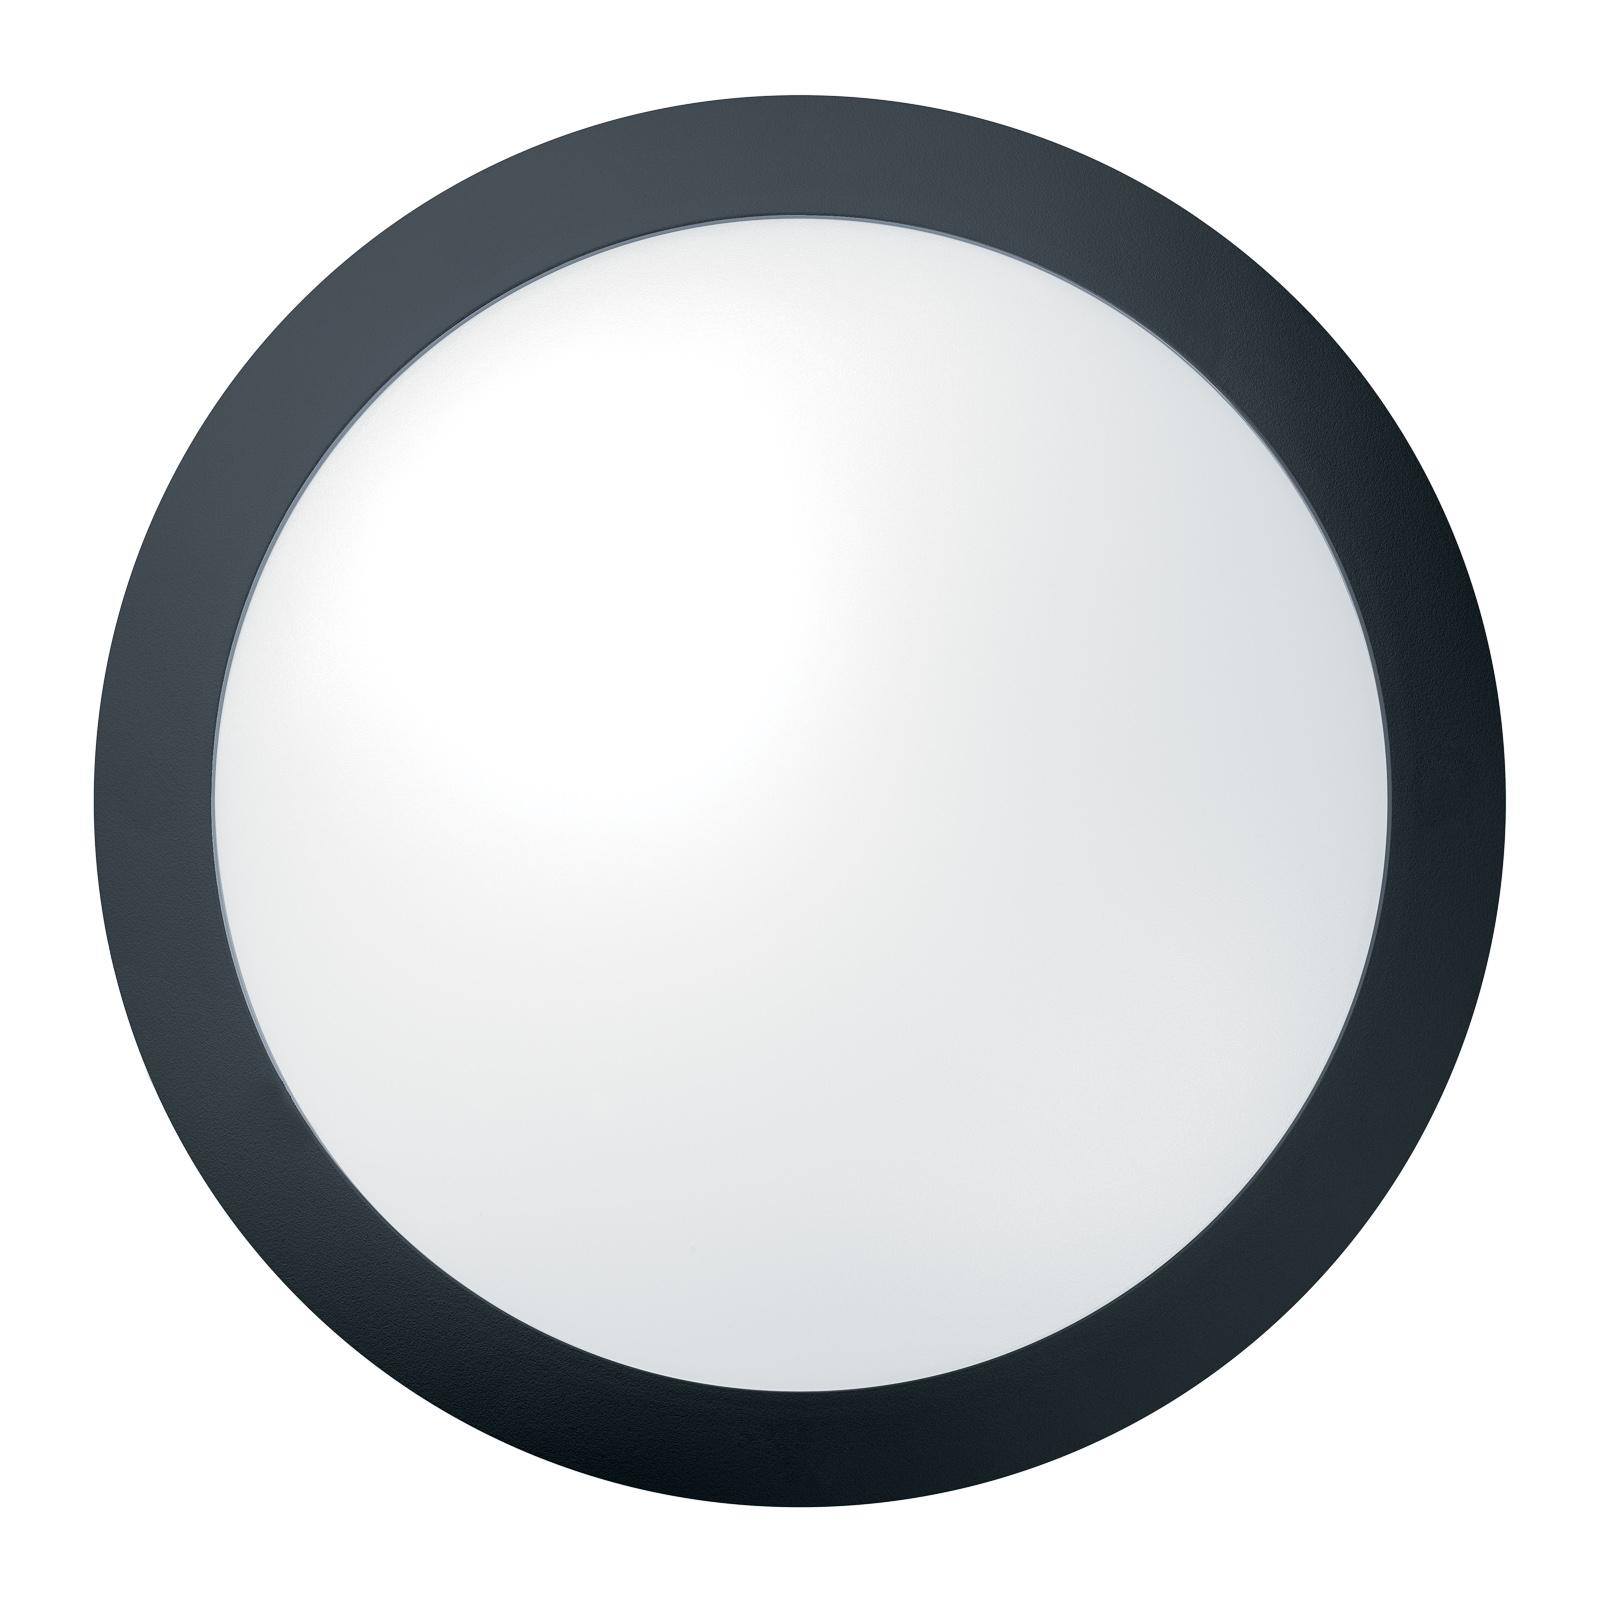 THORNeco Tom Vario Wandleuchte 20W Sensor schwarz